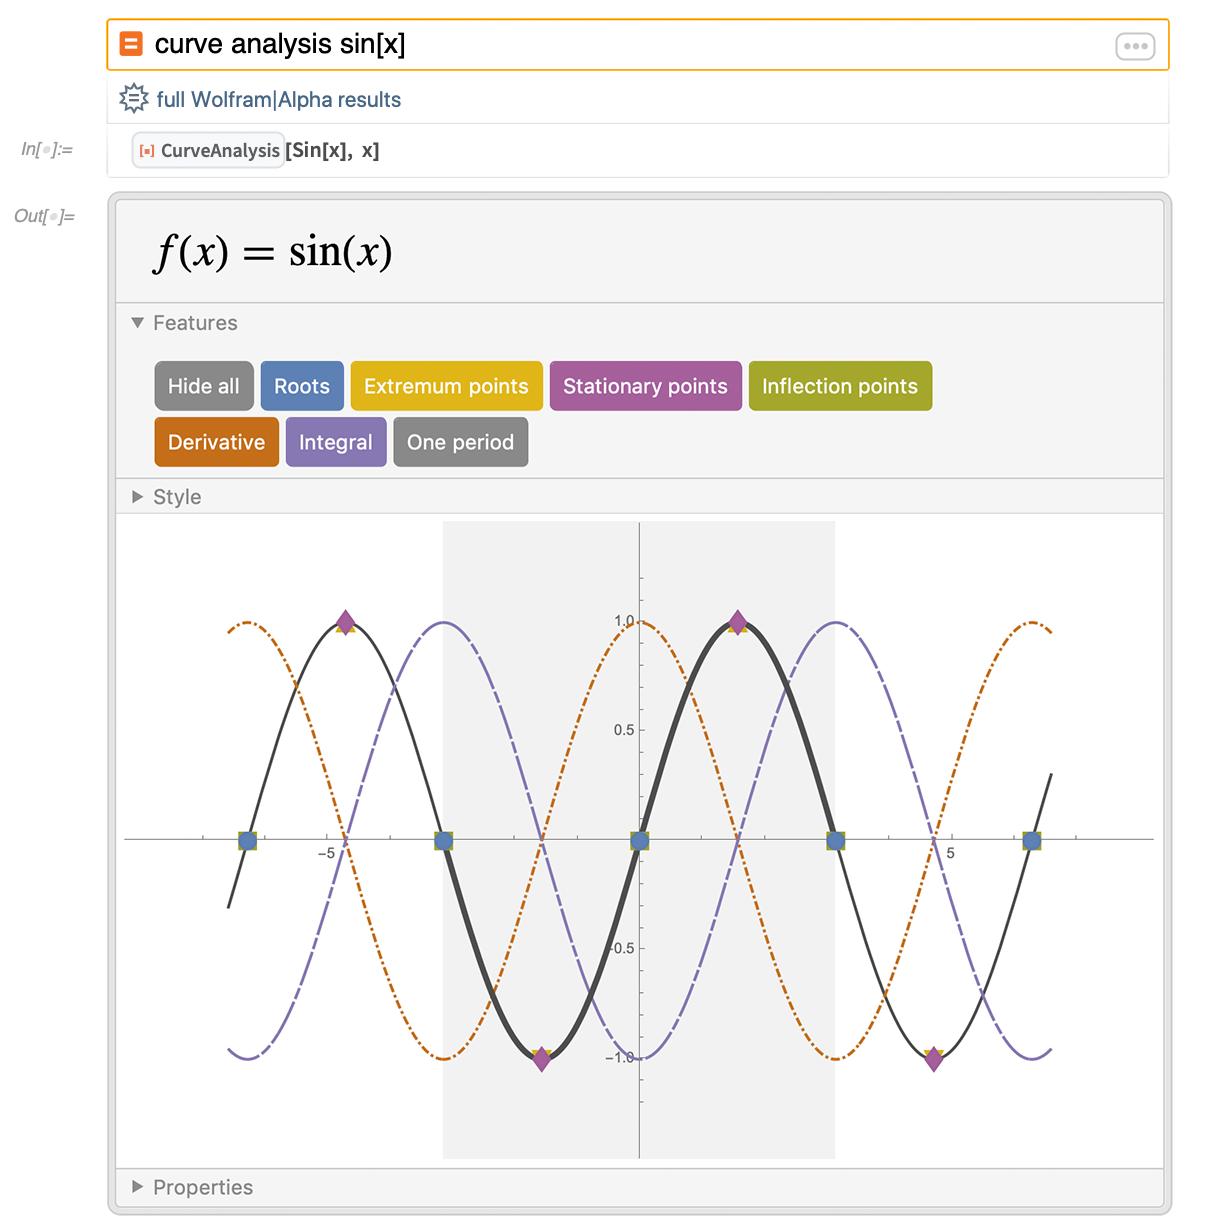 curve analysis sin[x]